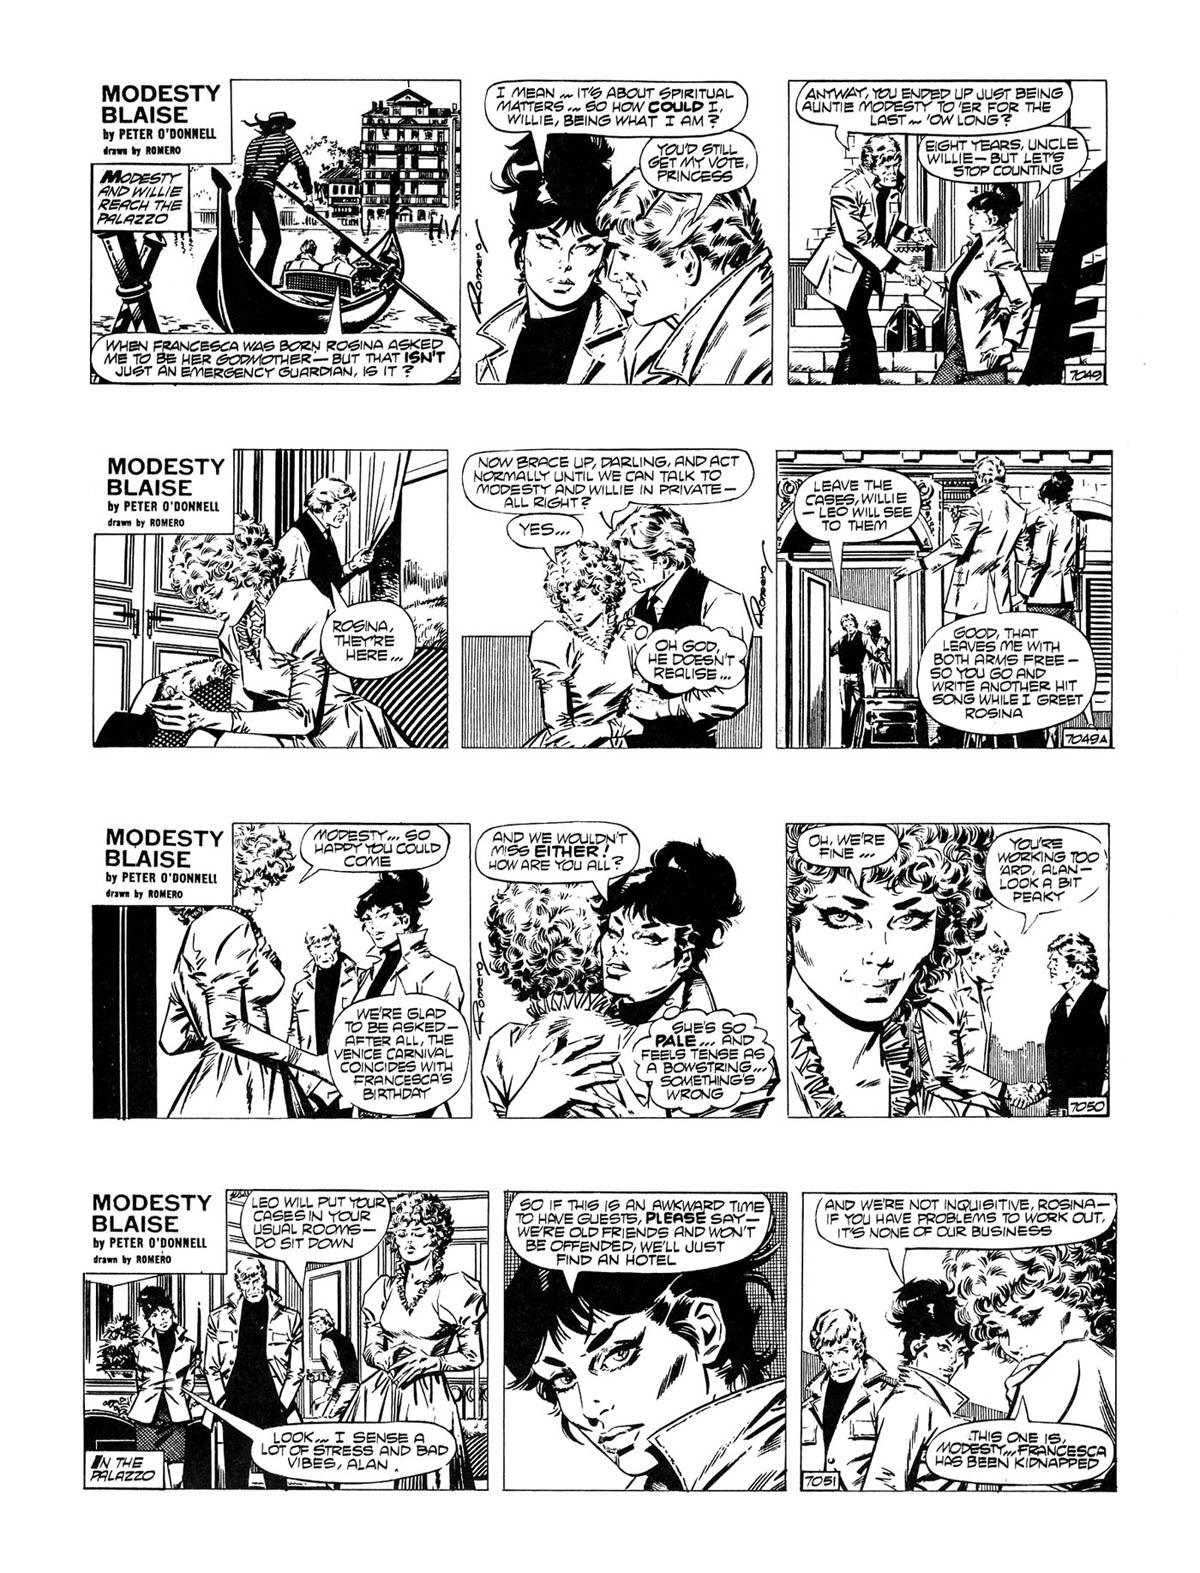 Read online Modesty Blaise Live bait comic -  Issue # TPB - 6